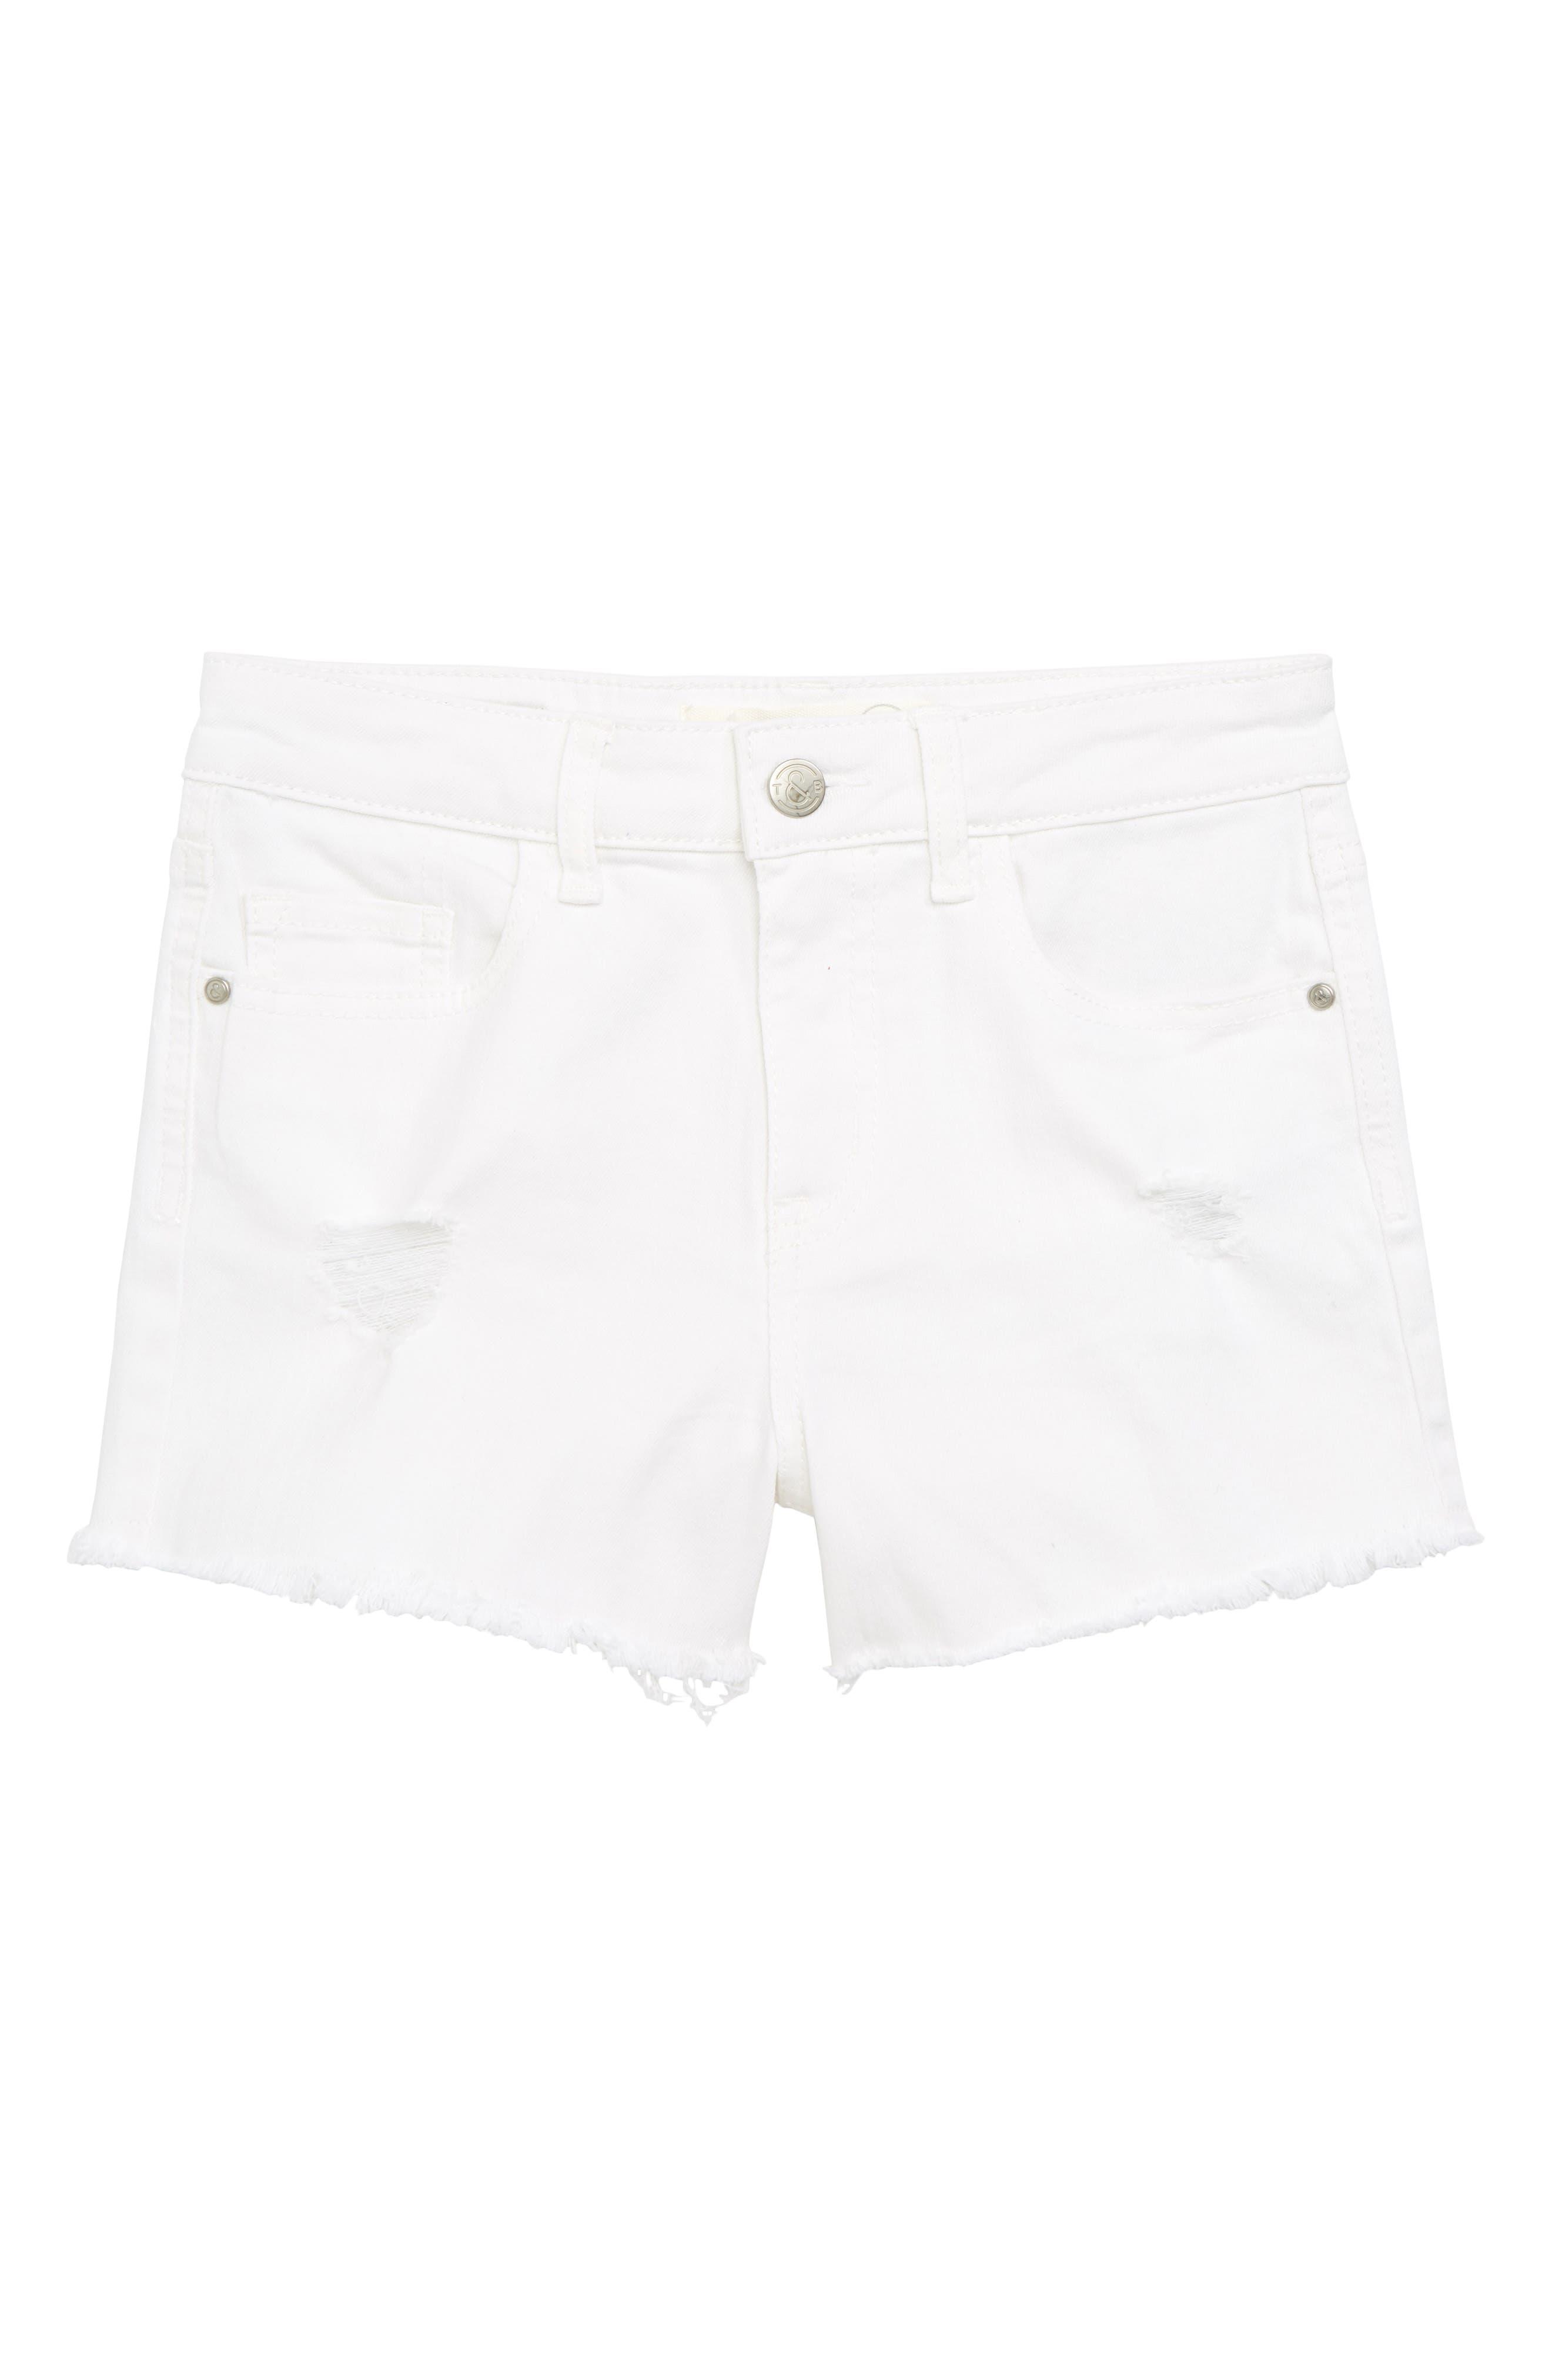 Treasure & Bond Distressed Cutoff Denim Shorts